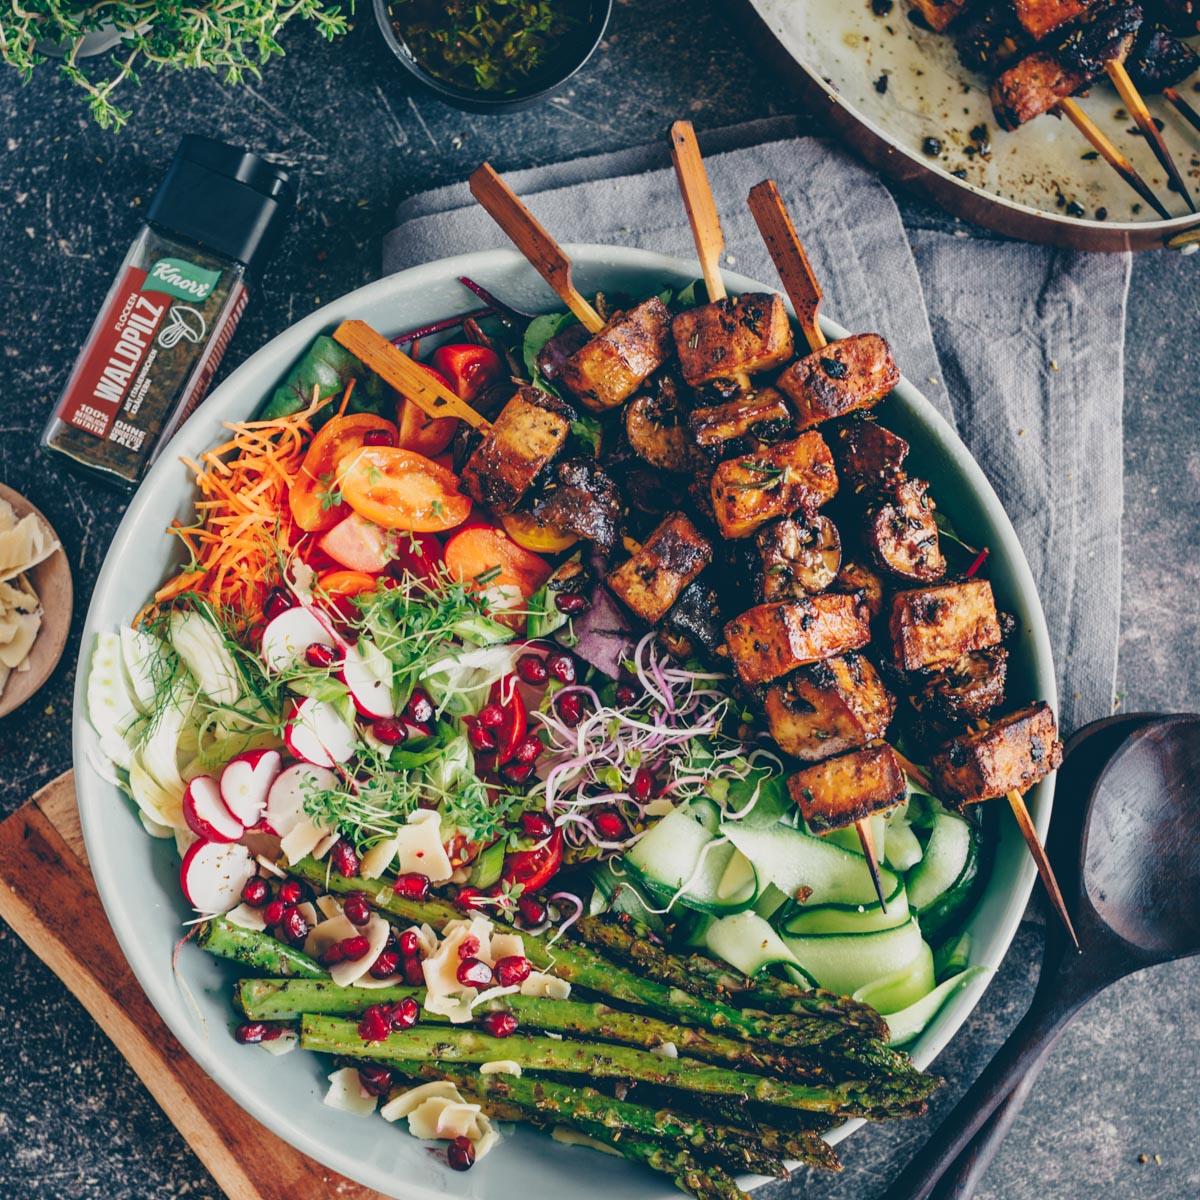 Gegrillte Tofu-Pilz Spiesse mit Salat